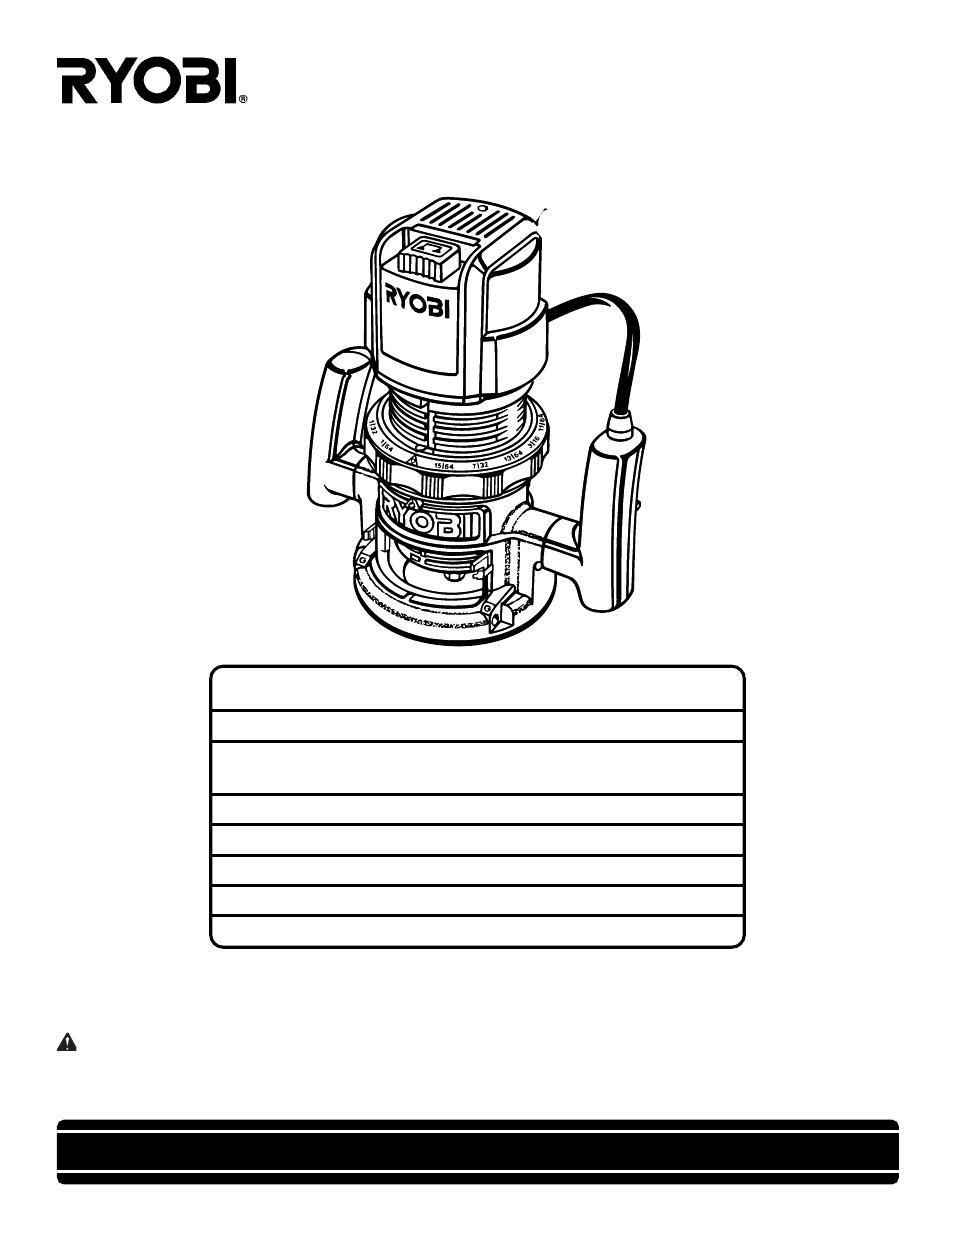 ryobi r180 user manual 16 pages rh manualsdir com Ryobi Drill Manuals Ryobi Weed Eater Operations Manual